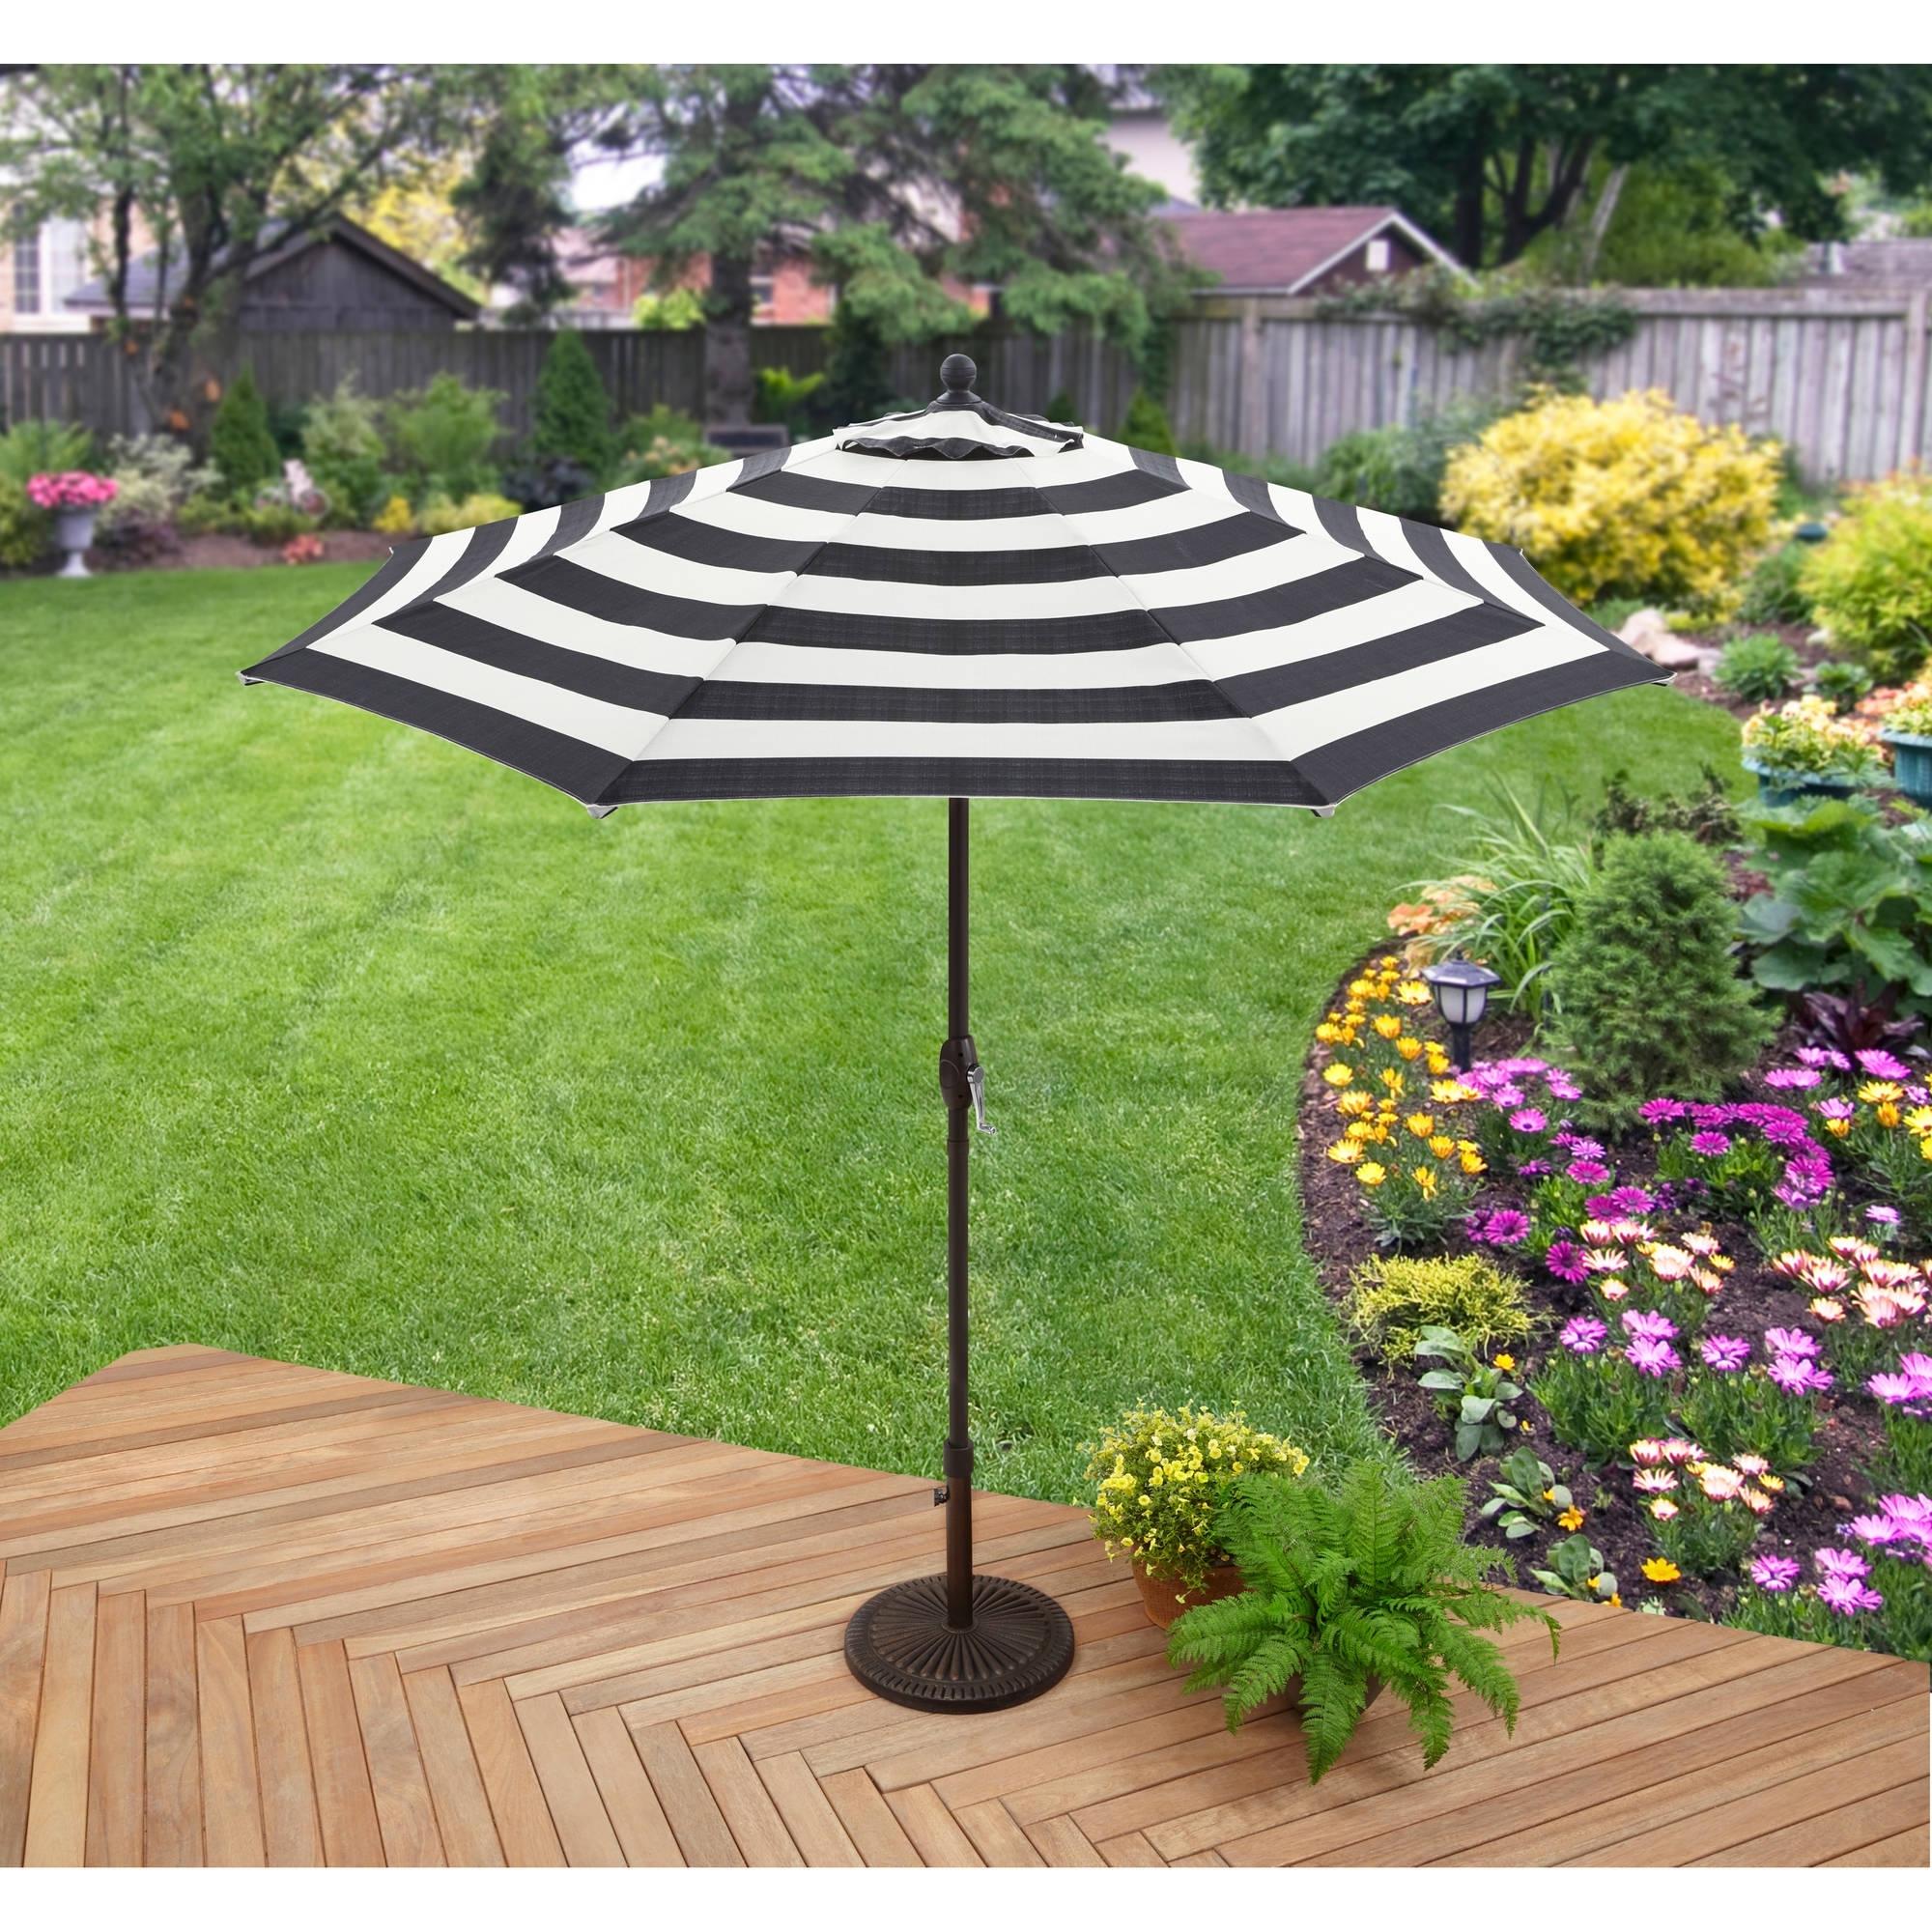 Favorite Custom Sunbrella Patio Umbrellas In Better Homes And Gardens 9' Market Umbrella, Cabana Stripe – Walmart (View 9 of 20)